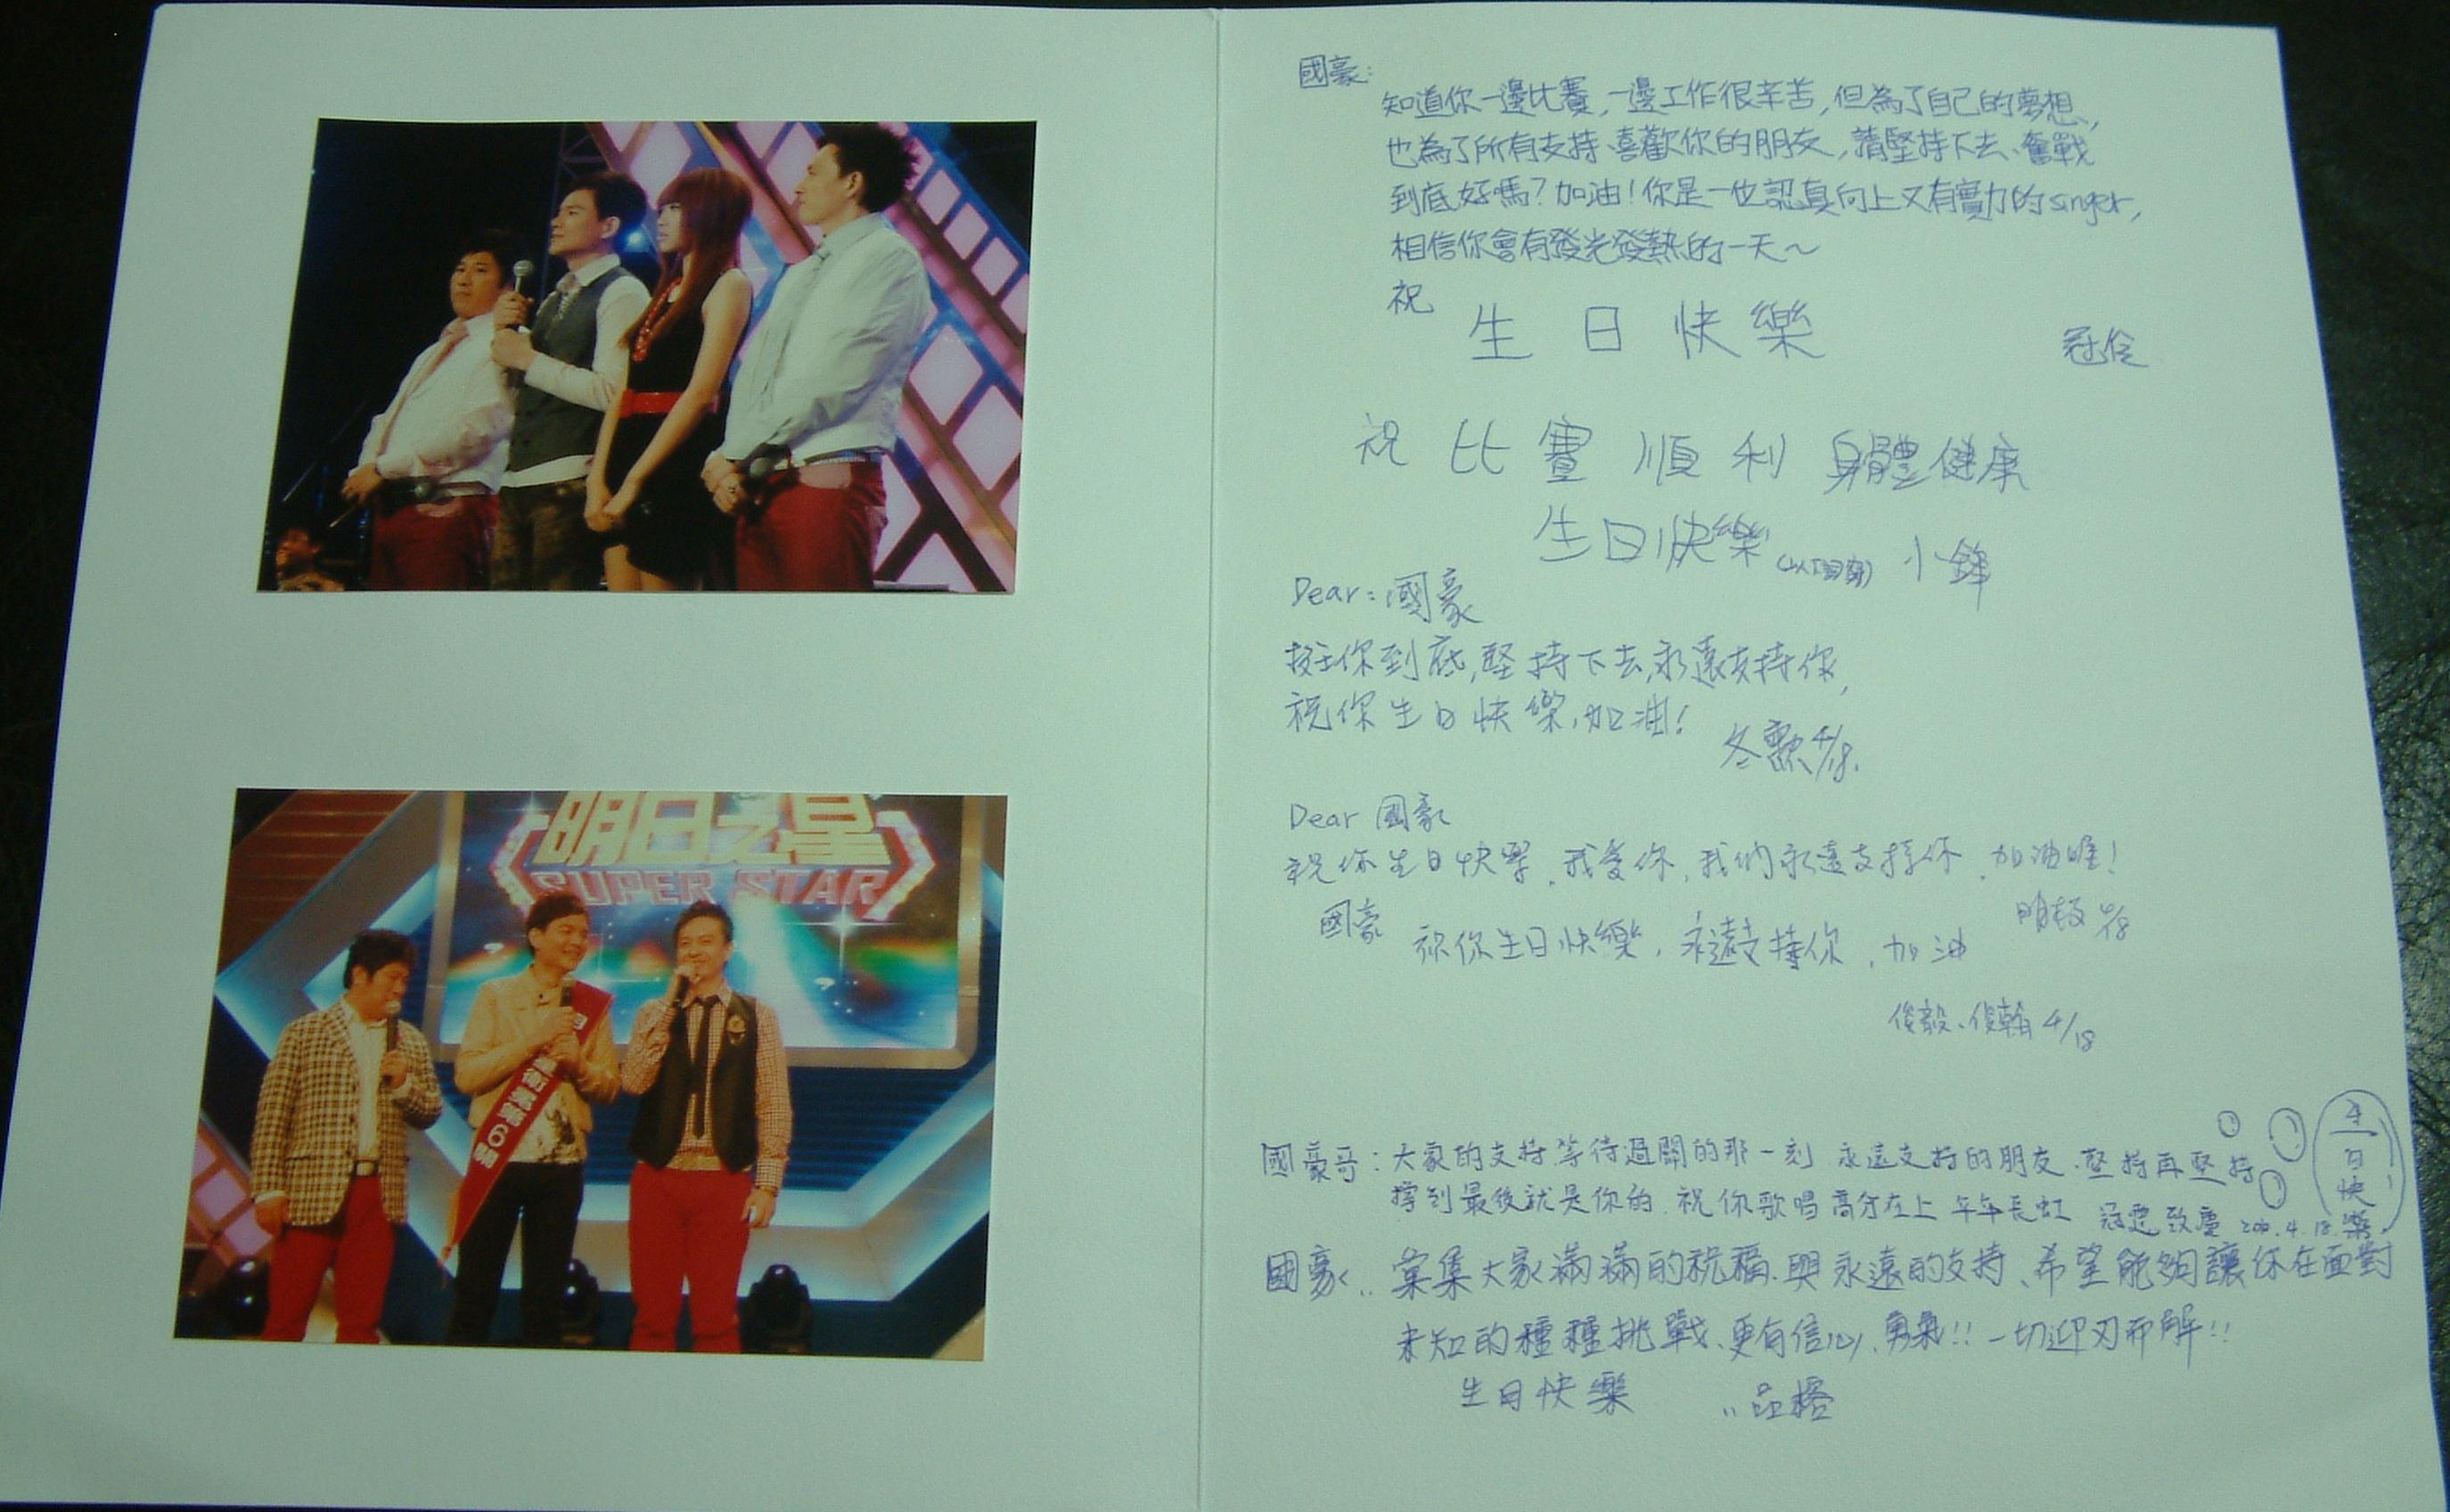 bd card-7.jpg